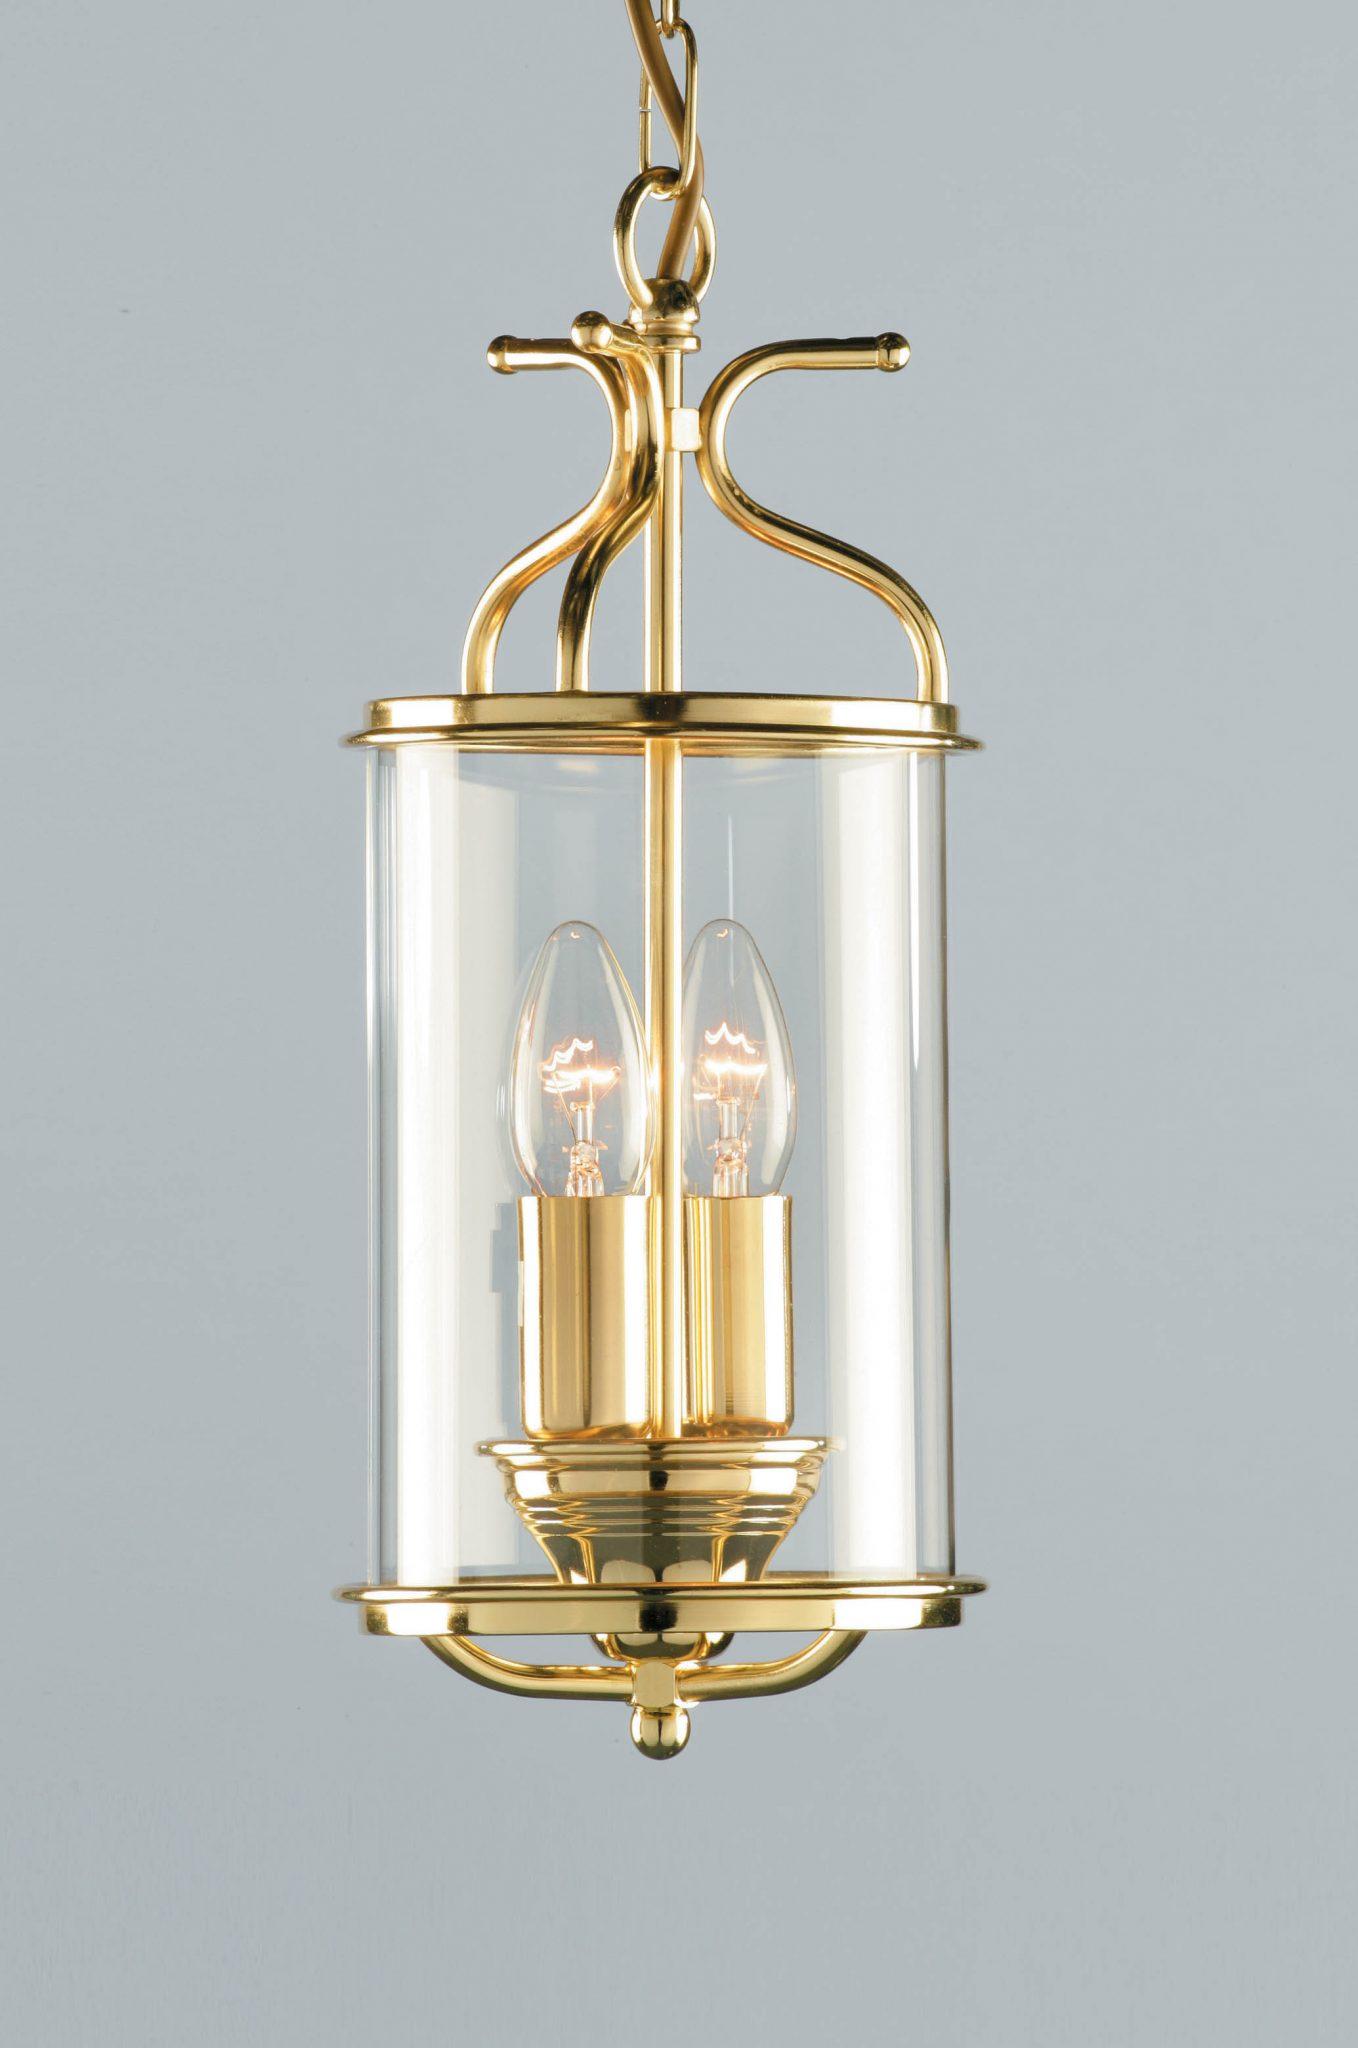 Impex LG00029/PB Winchester 2 light Lantern, Polished Brass